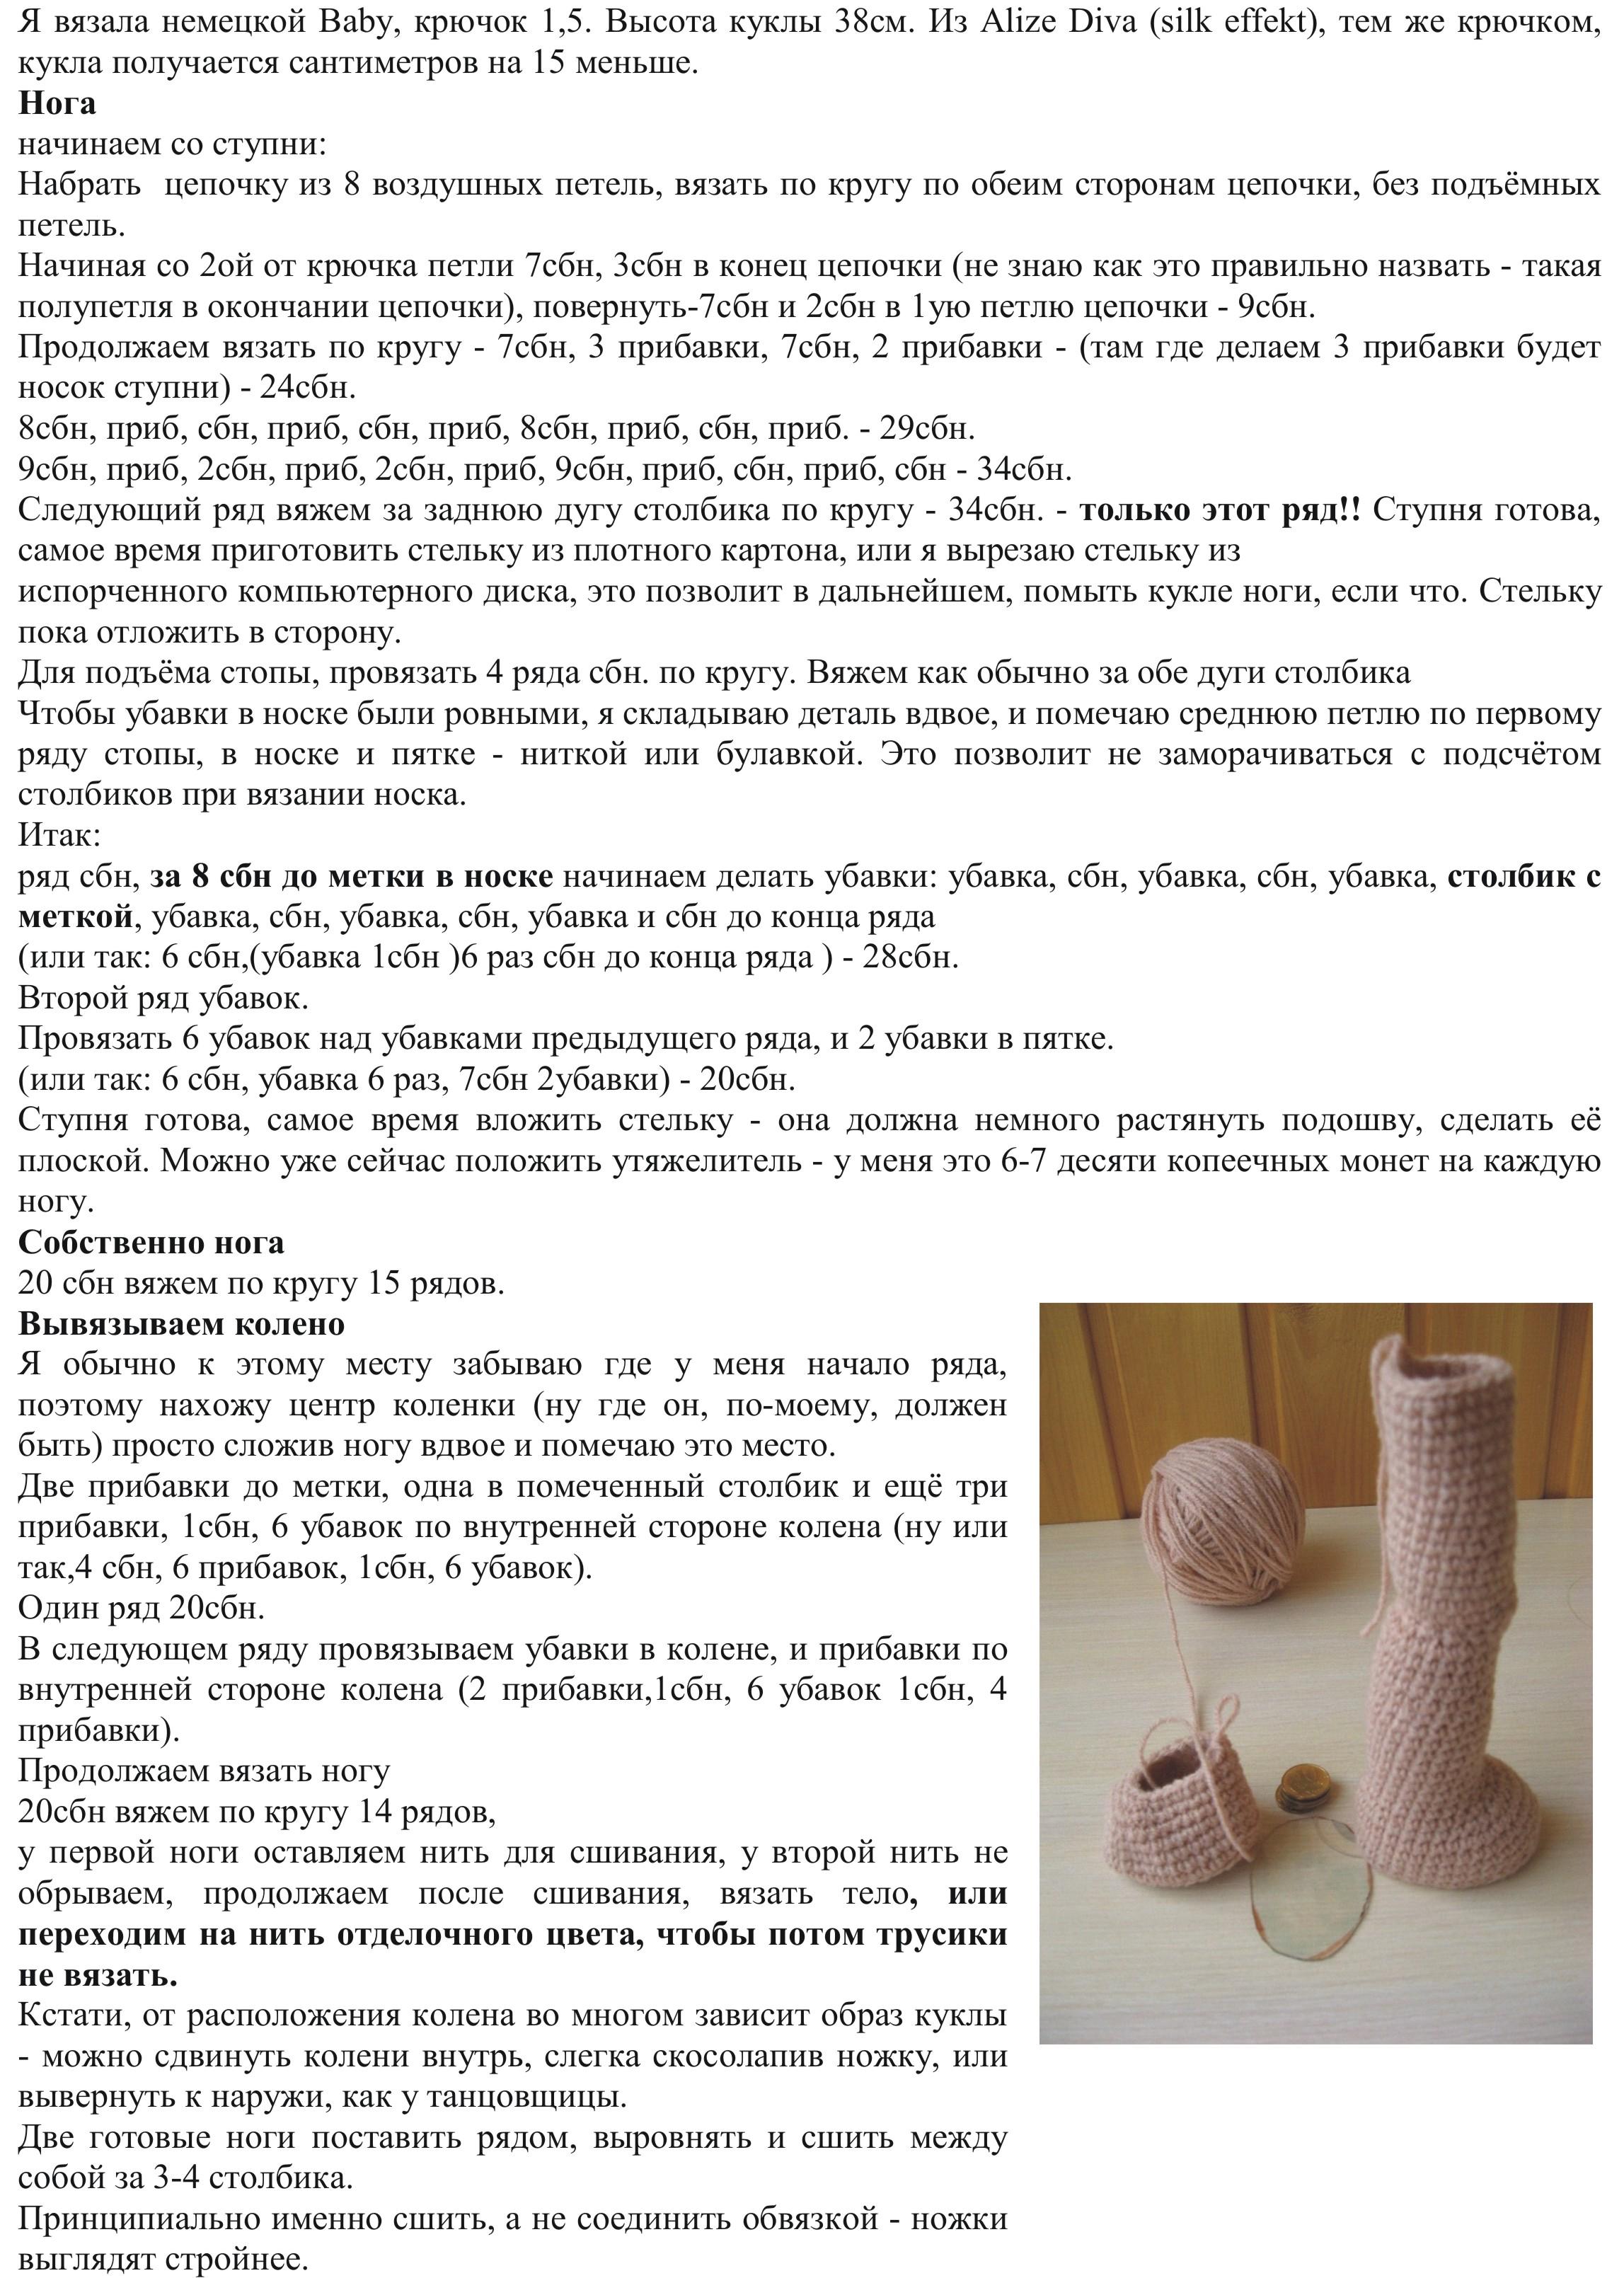 http://amigurumi.com.ua/forum/uploads/photo/116/fb1369cf009eb06b9eaa96ae5f5d89af.jpg